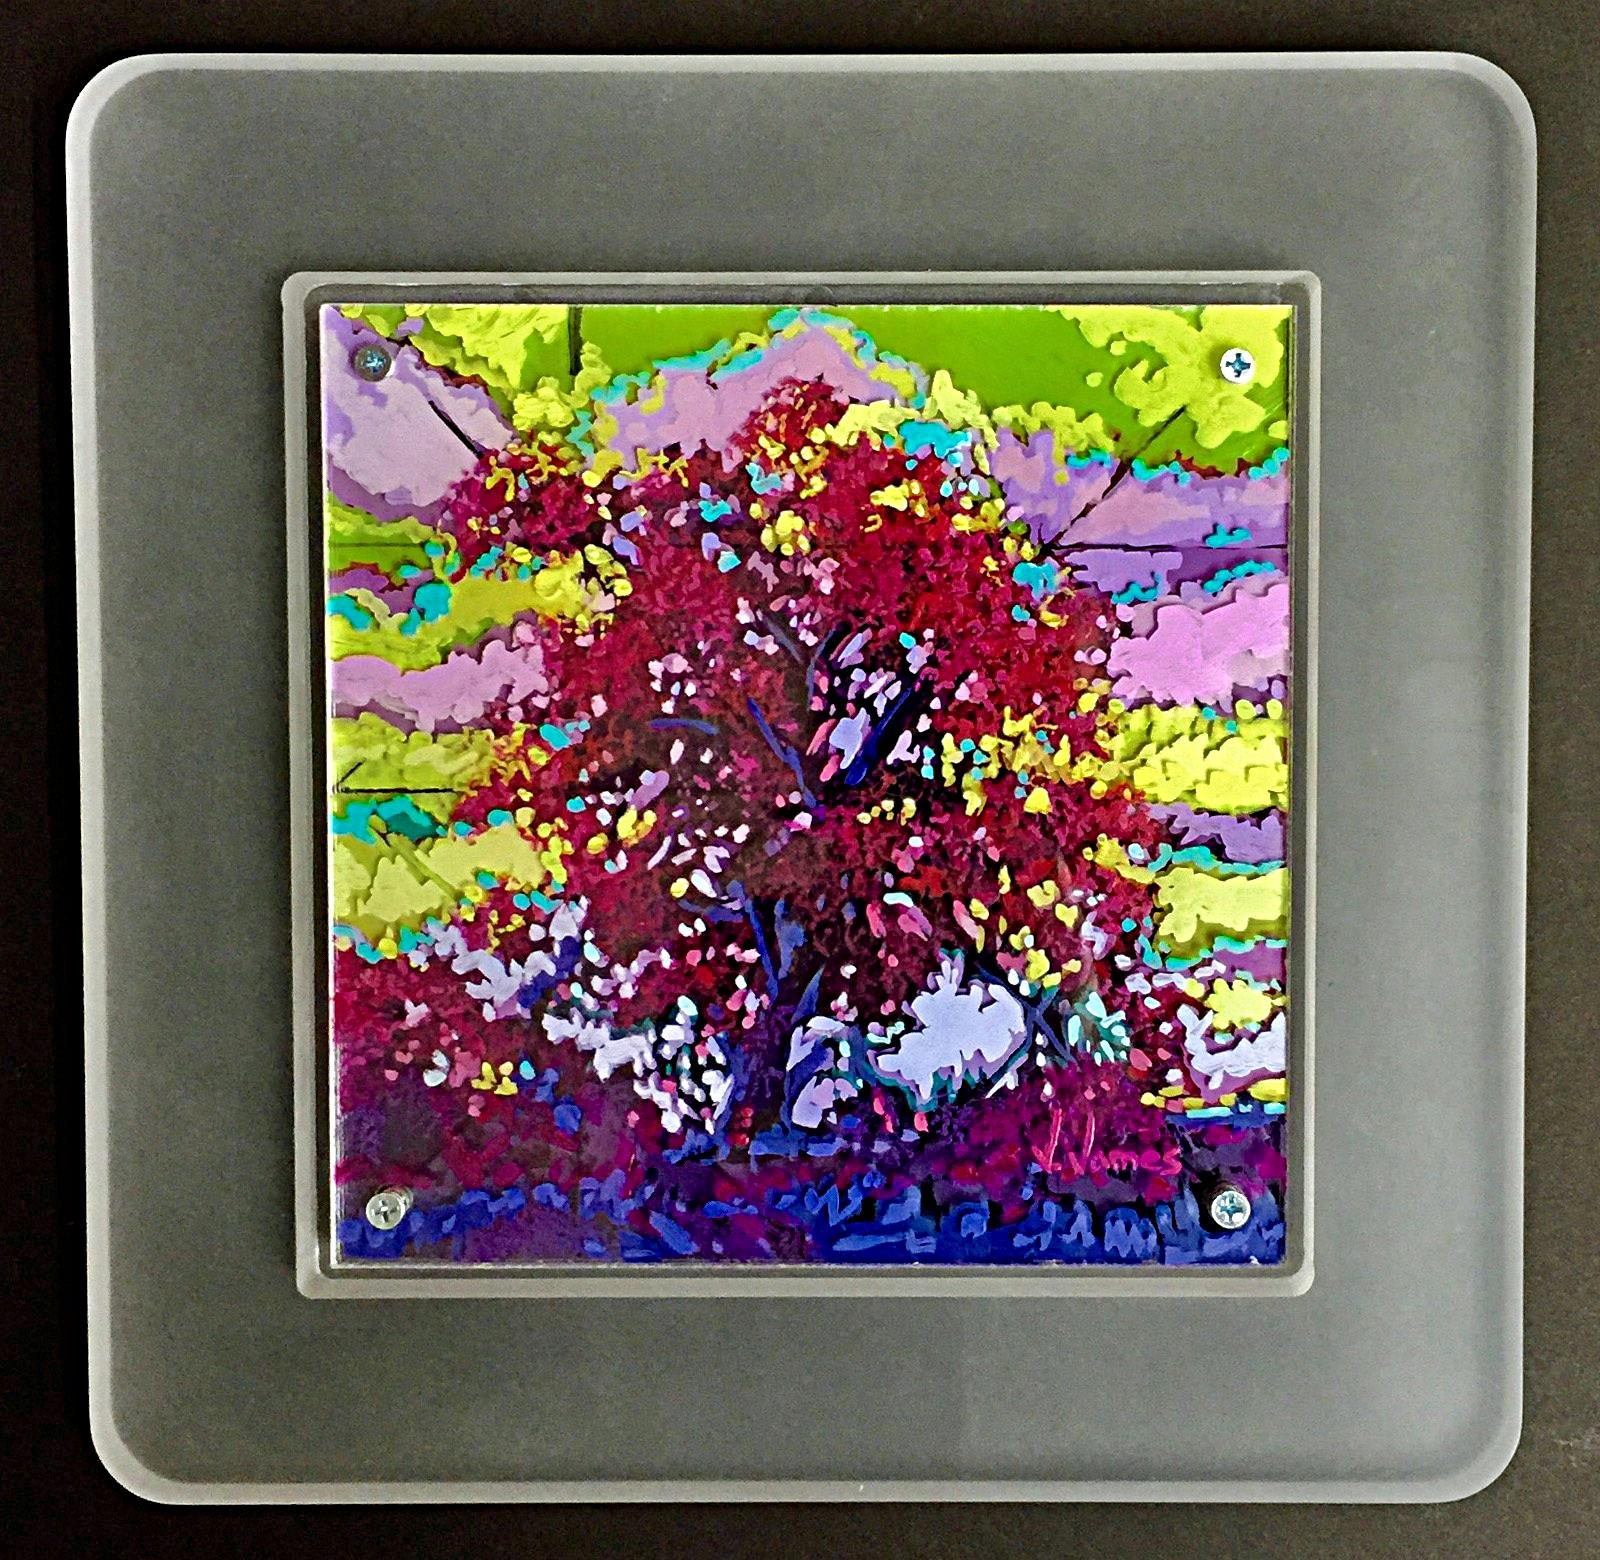 "Southern Juniper, 8"" x 8"" Acrylic on Multi-Layered Acrylic Glass"